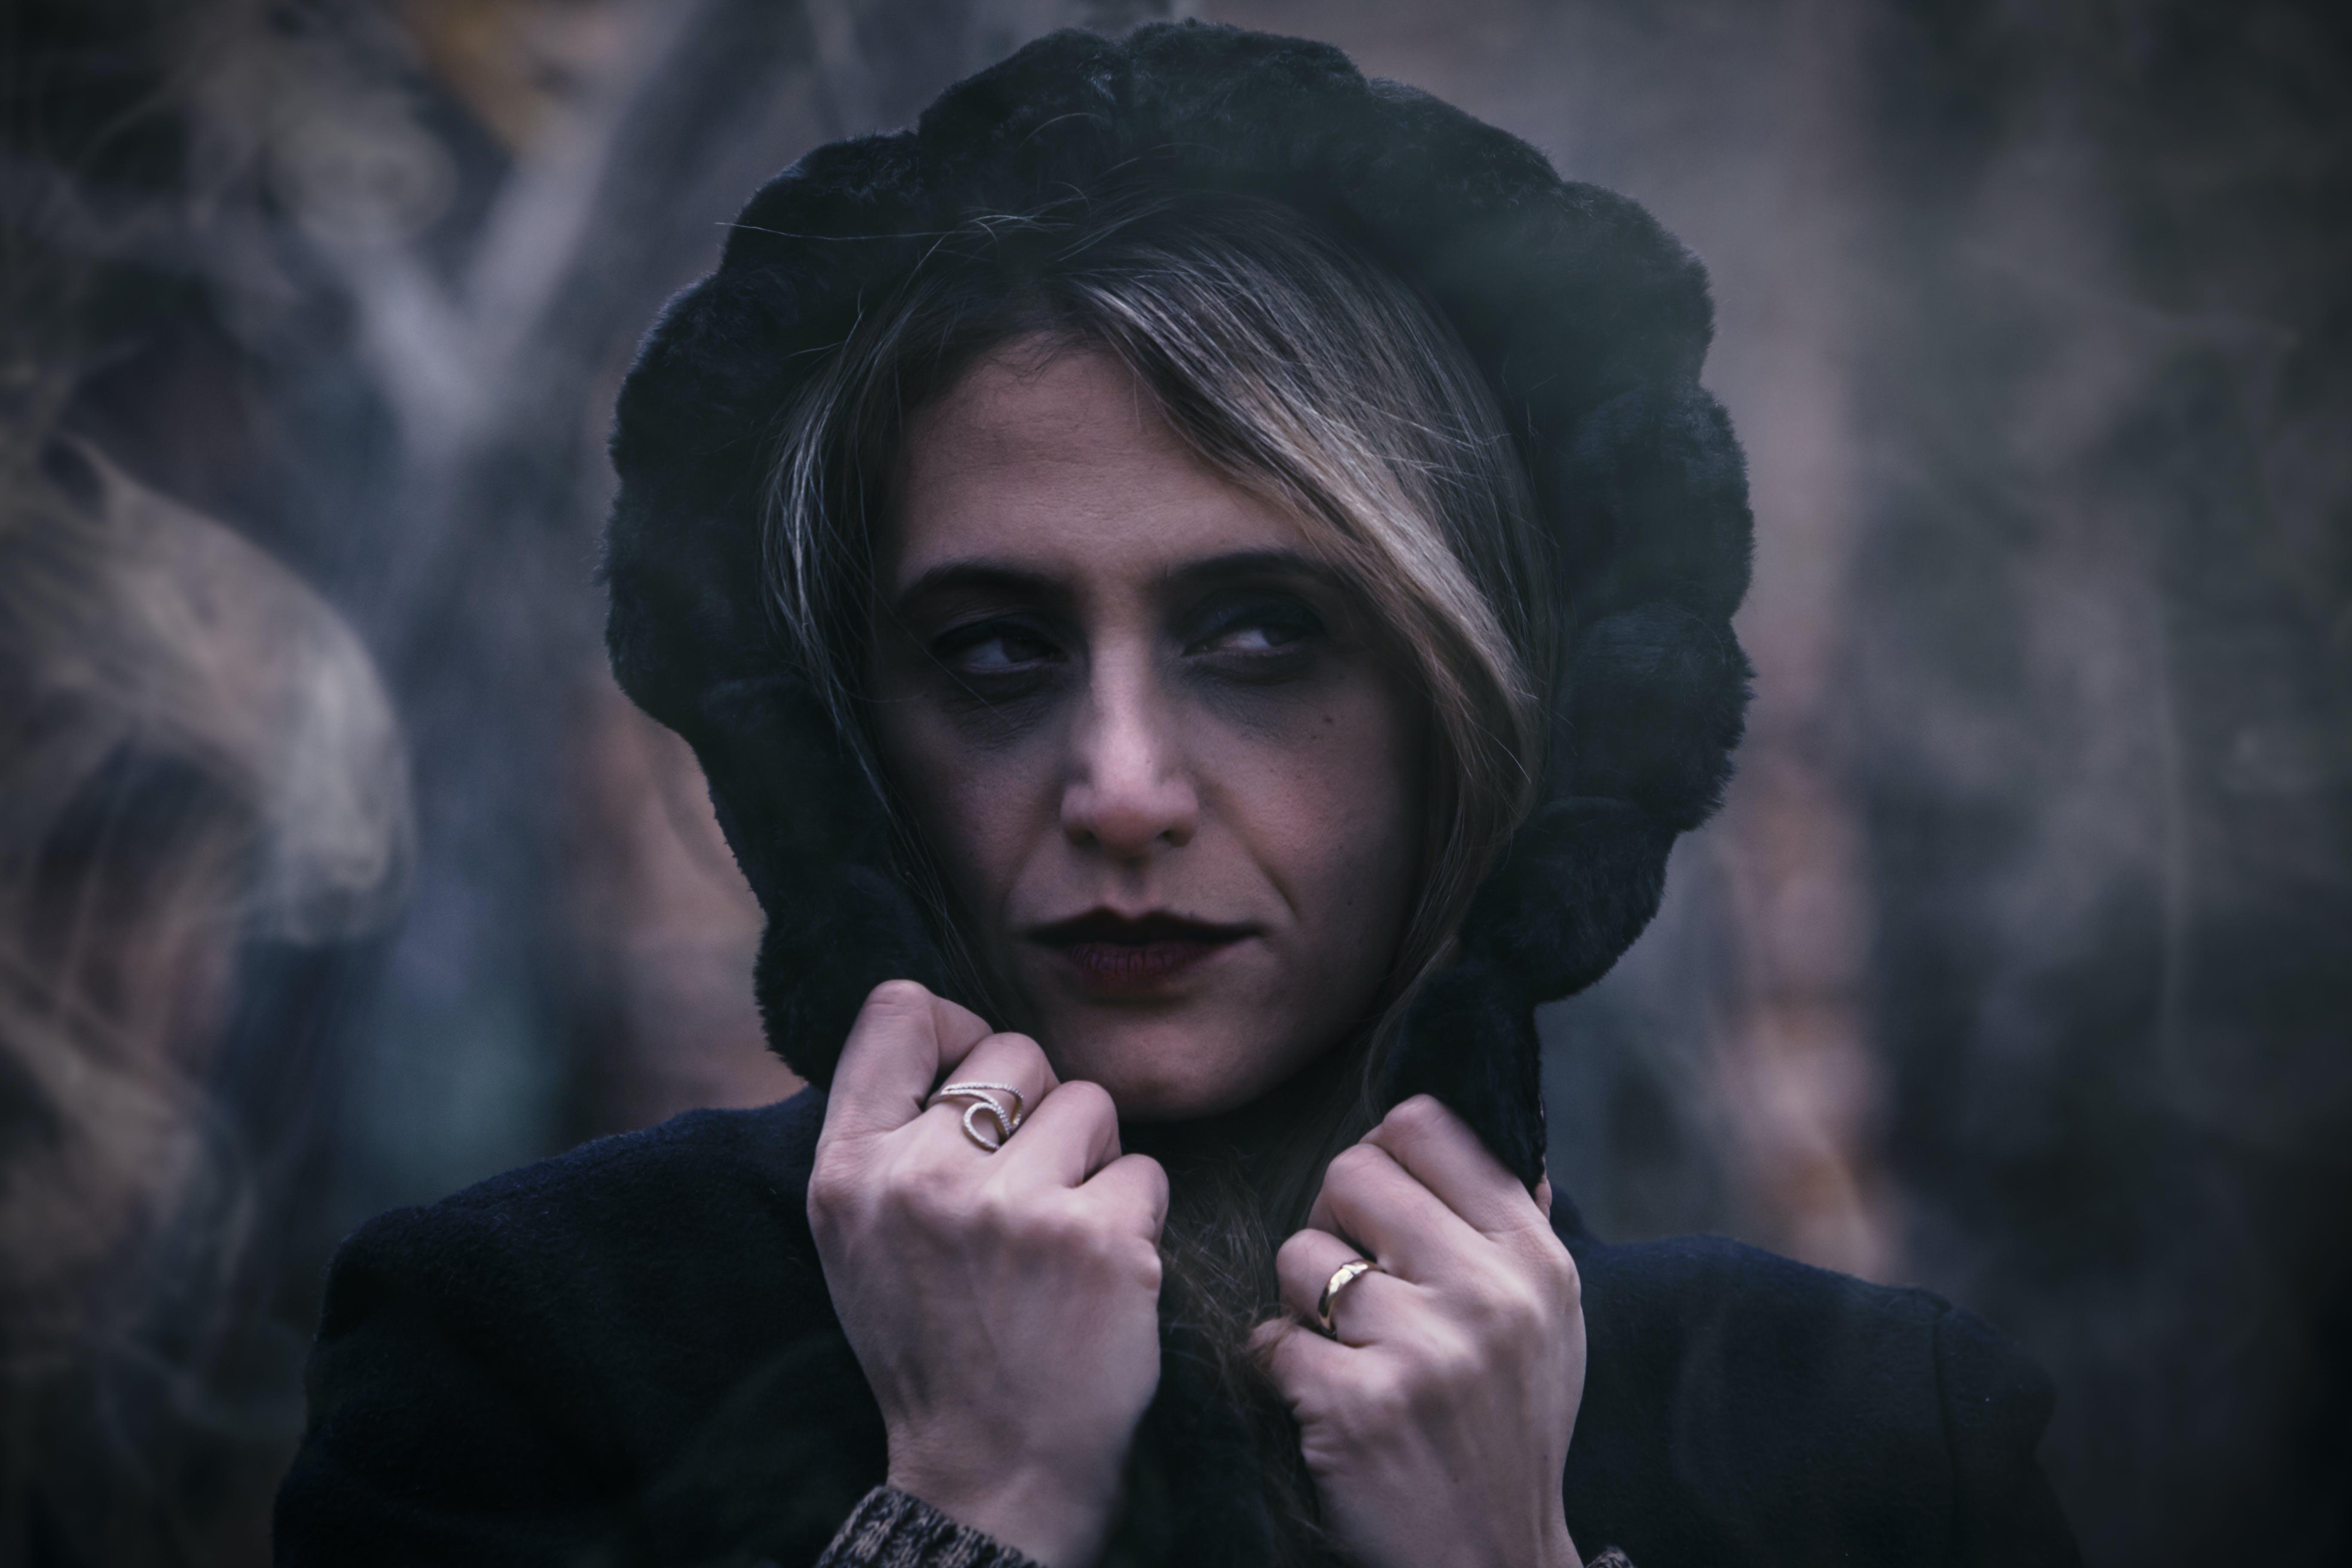 Close-Up Photo of Woman Wearing Black Hood